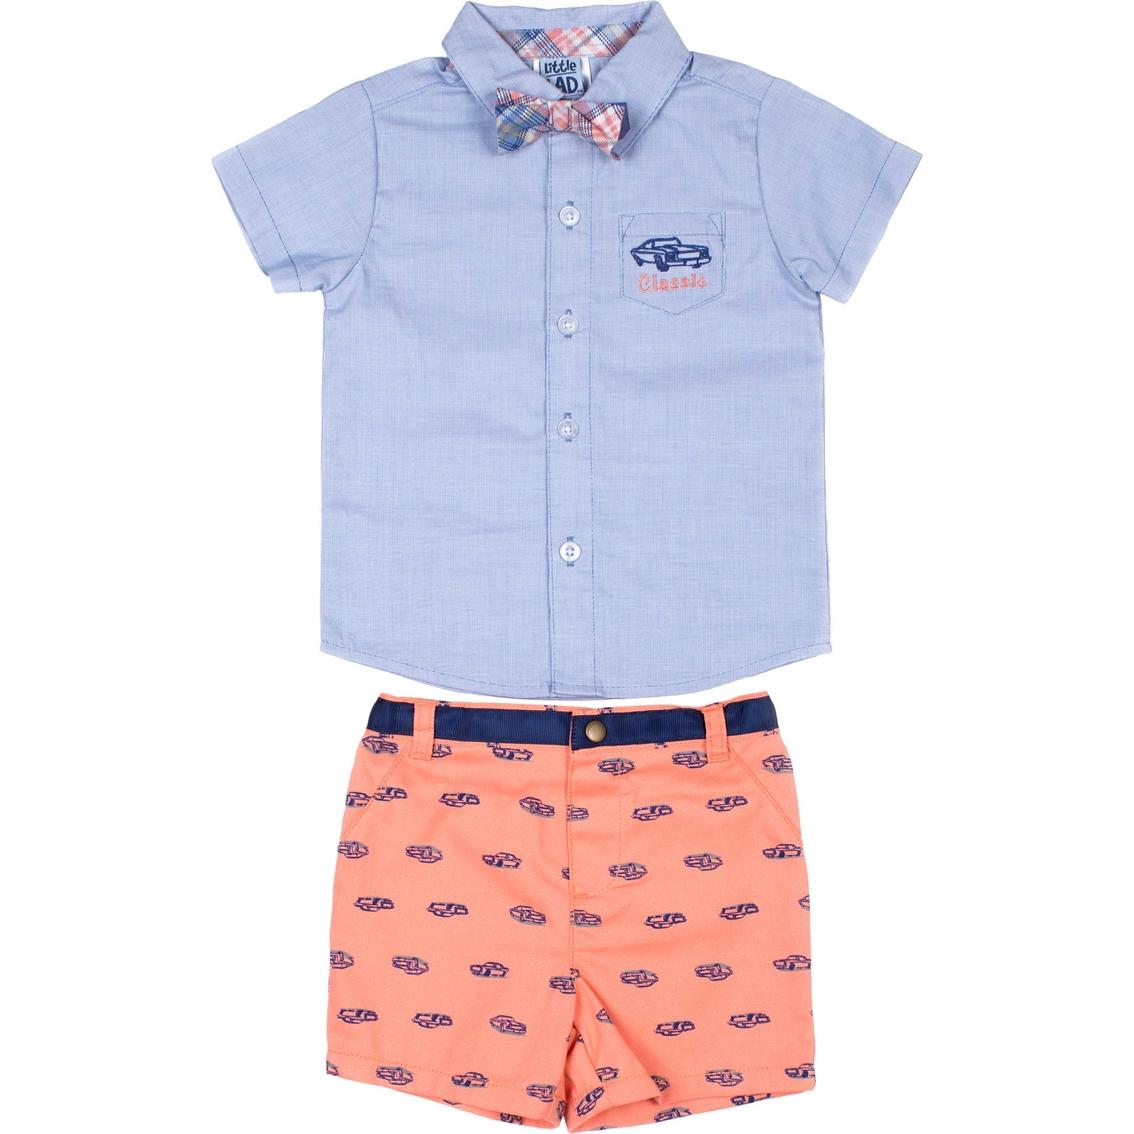 c96b616f0 Little Lads Infant Boys Chambray Shirt   Printed Shorts